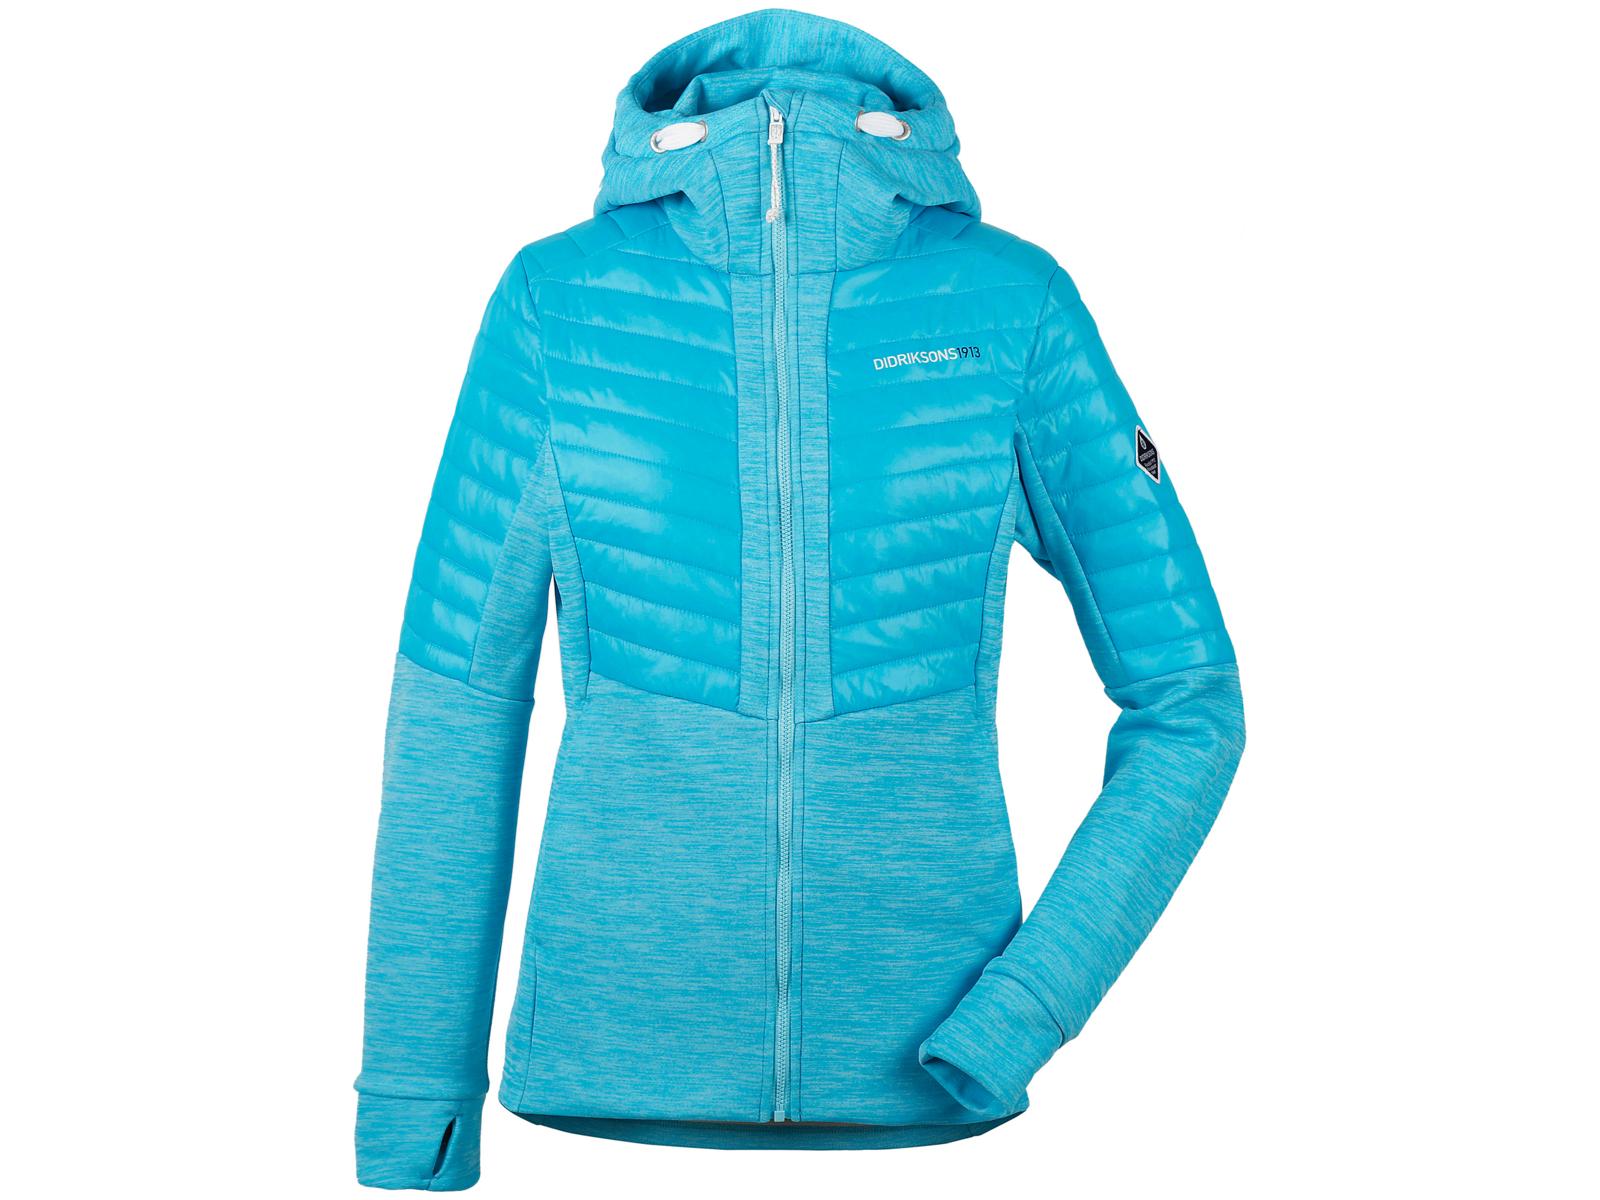 Didriksons Annema Womens Jacket Softshelljakke Dame Turkis (DKK 400,00)